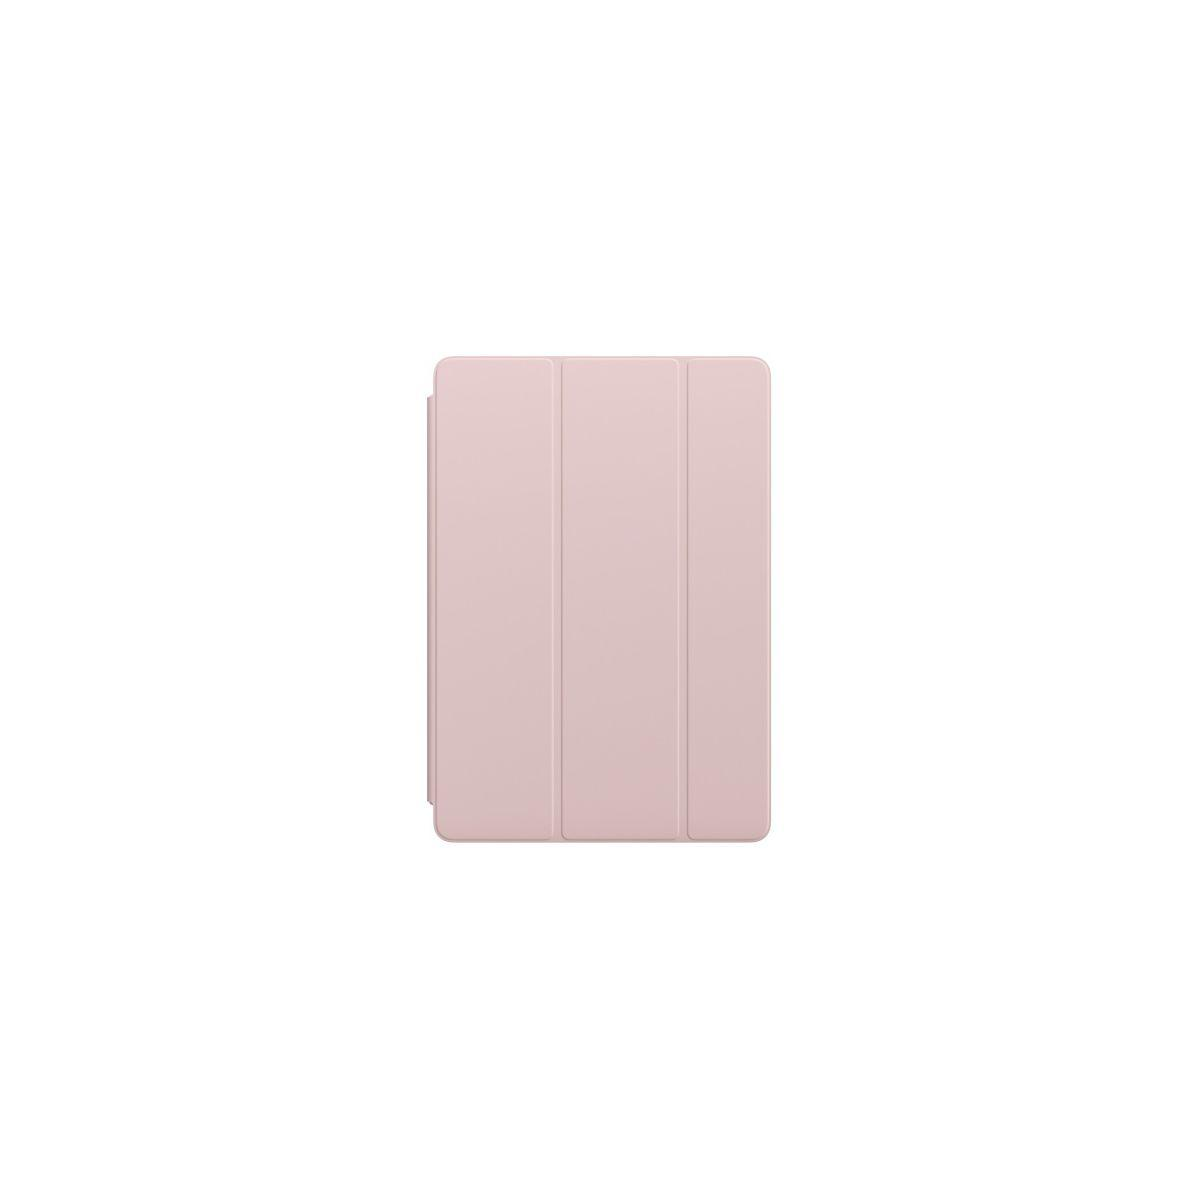 Etui tablette apple smart cover ipad pro 10.5 rose sable (photo)